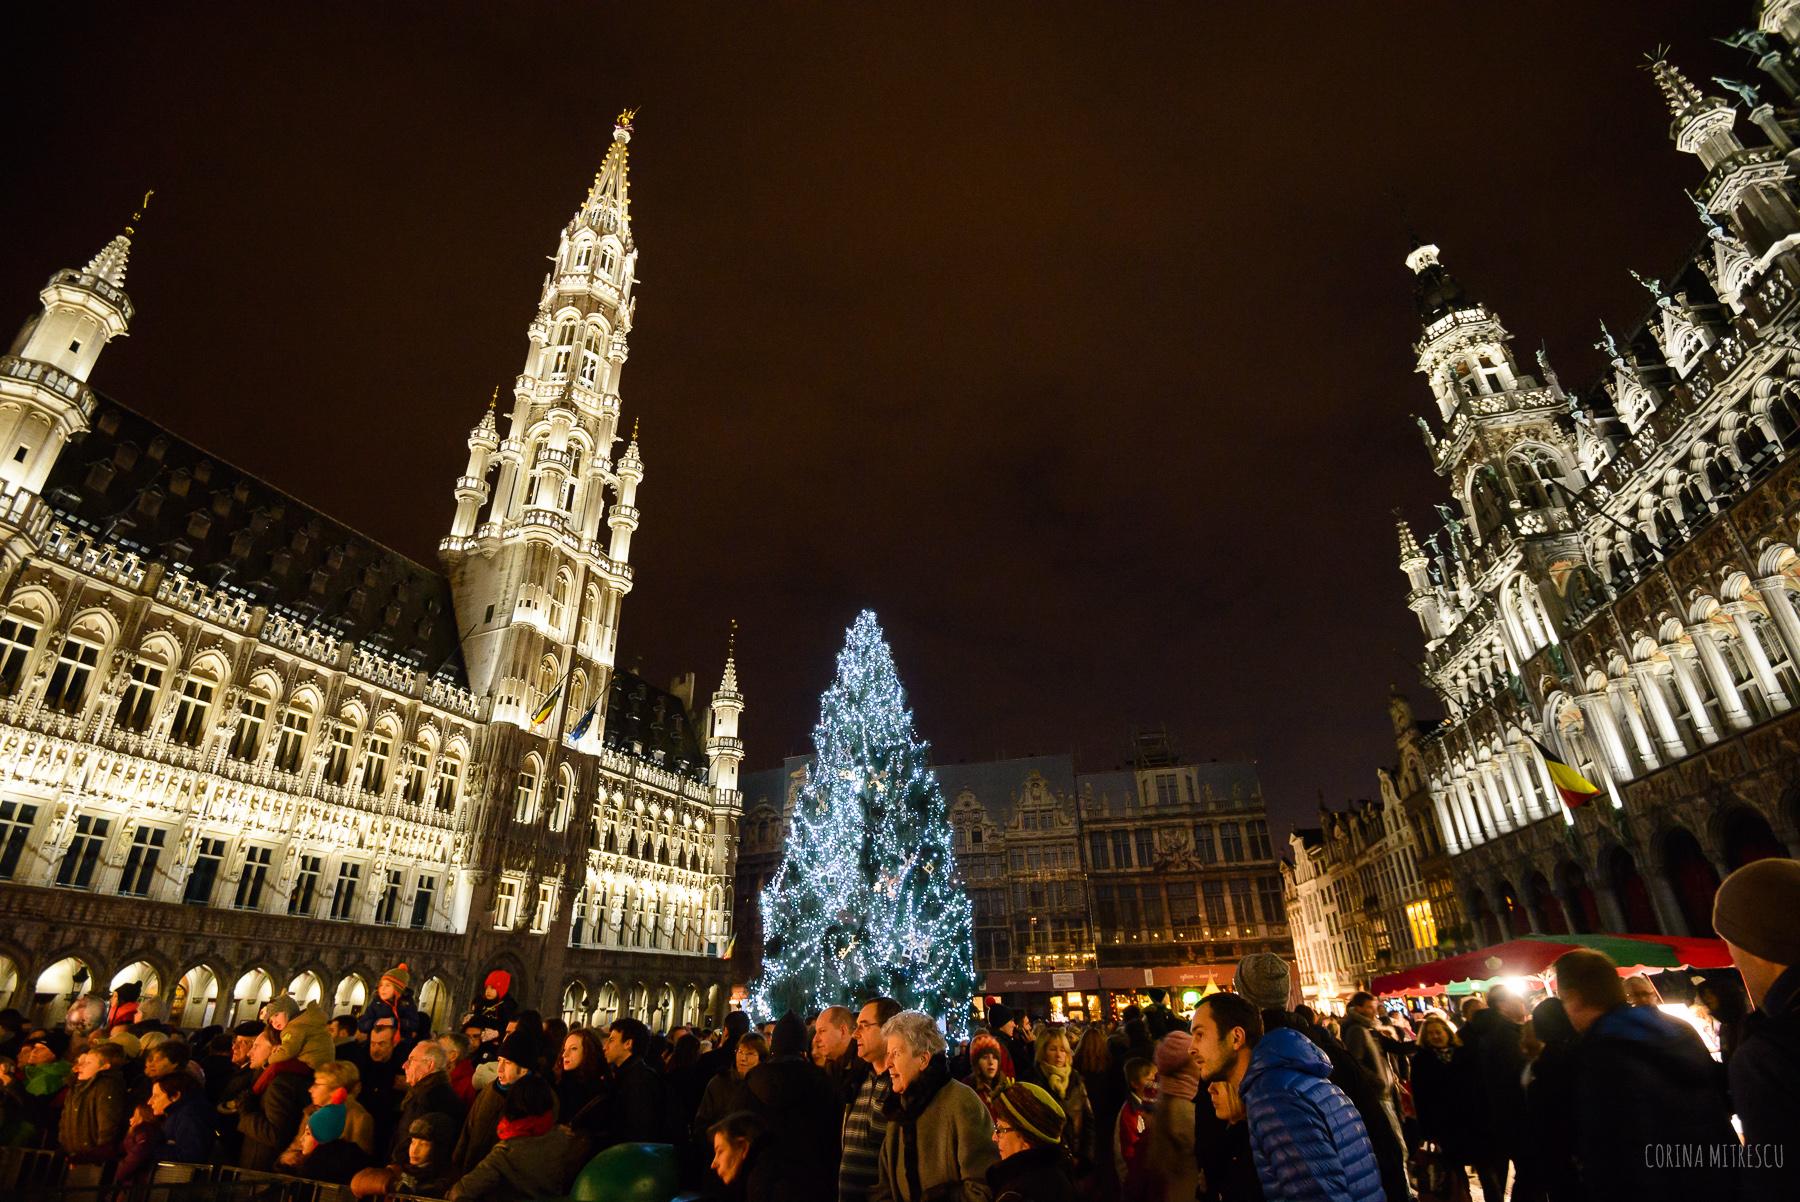 #A56126 Christmas 2014 In Brussels Belgium PhotoCory 5353 decorations de noel bruxelles 1800x1202 px @ aertt.com